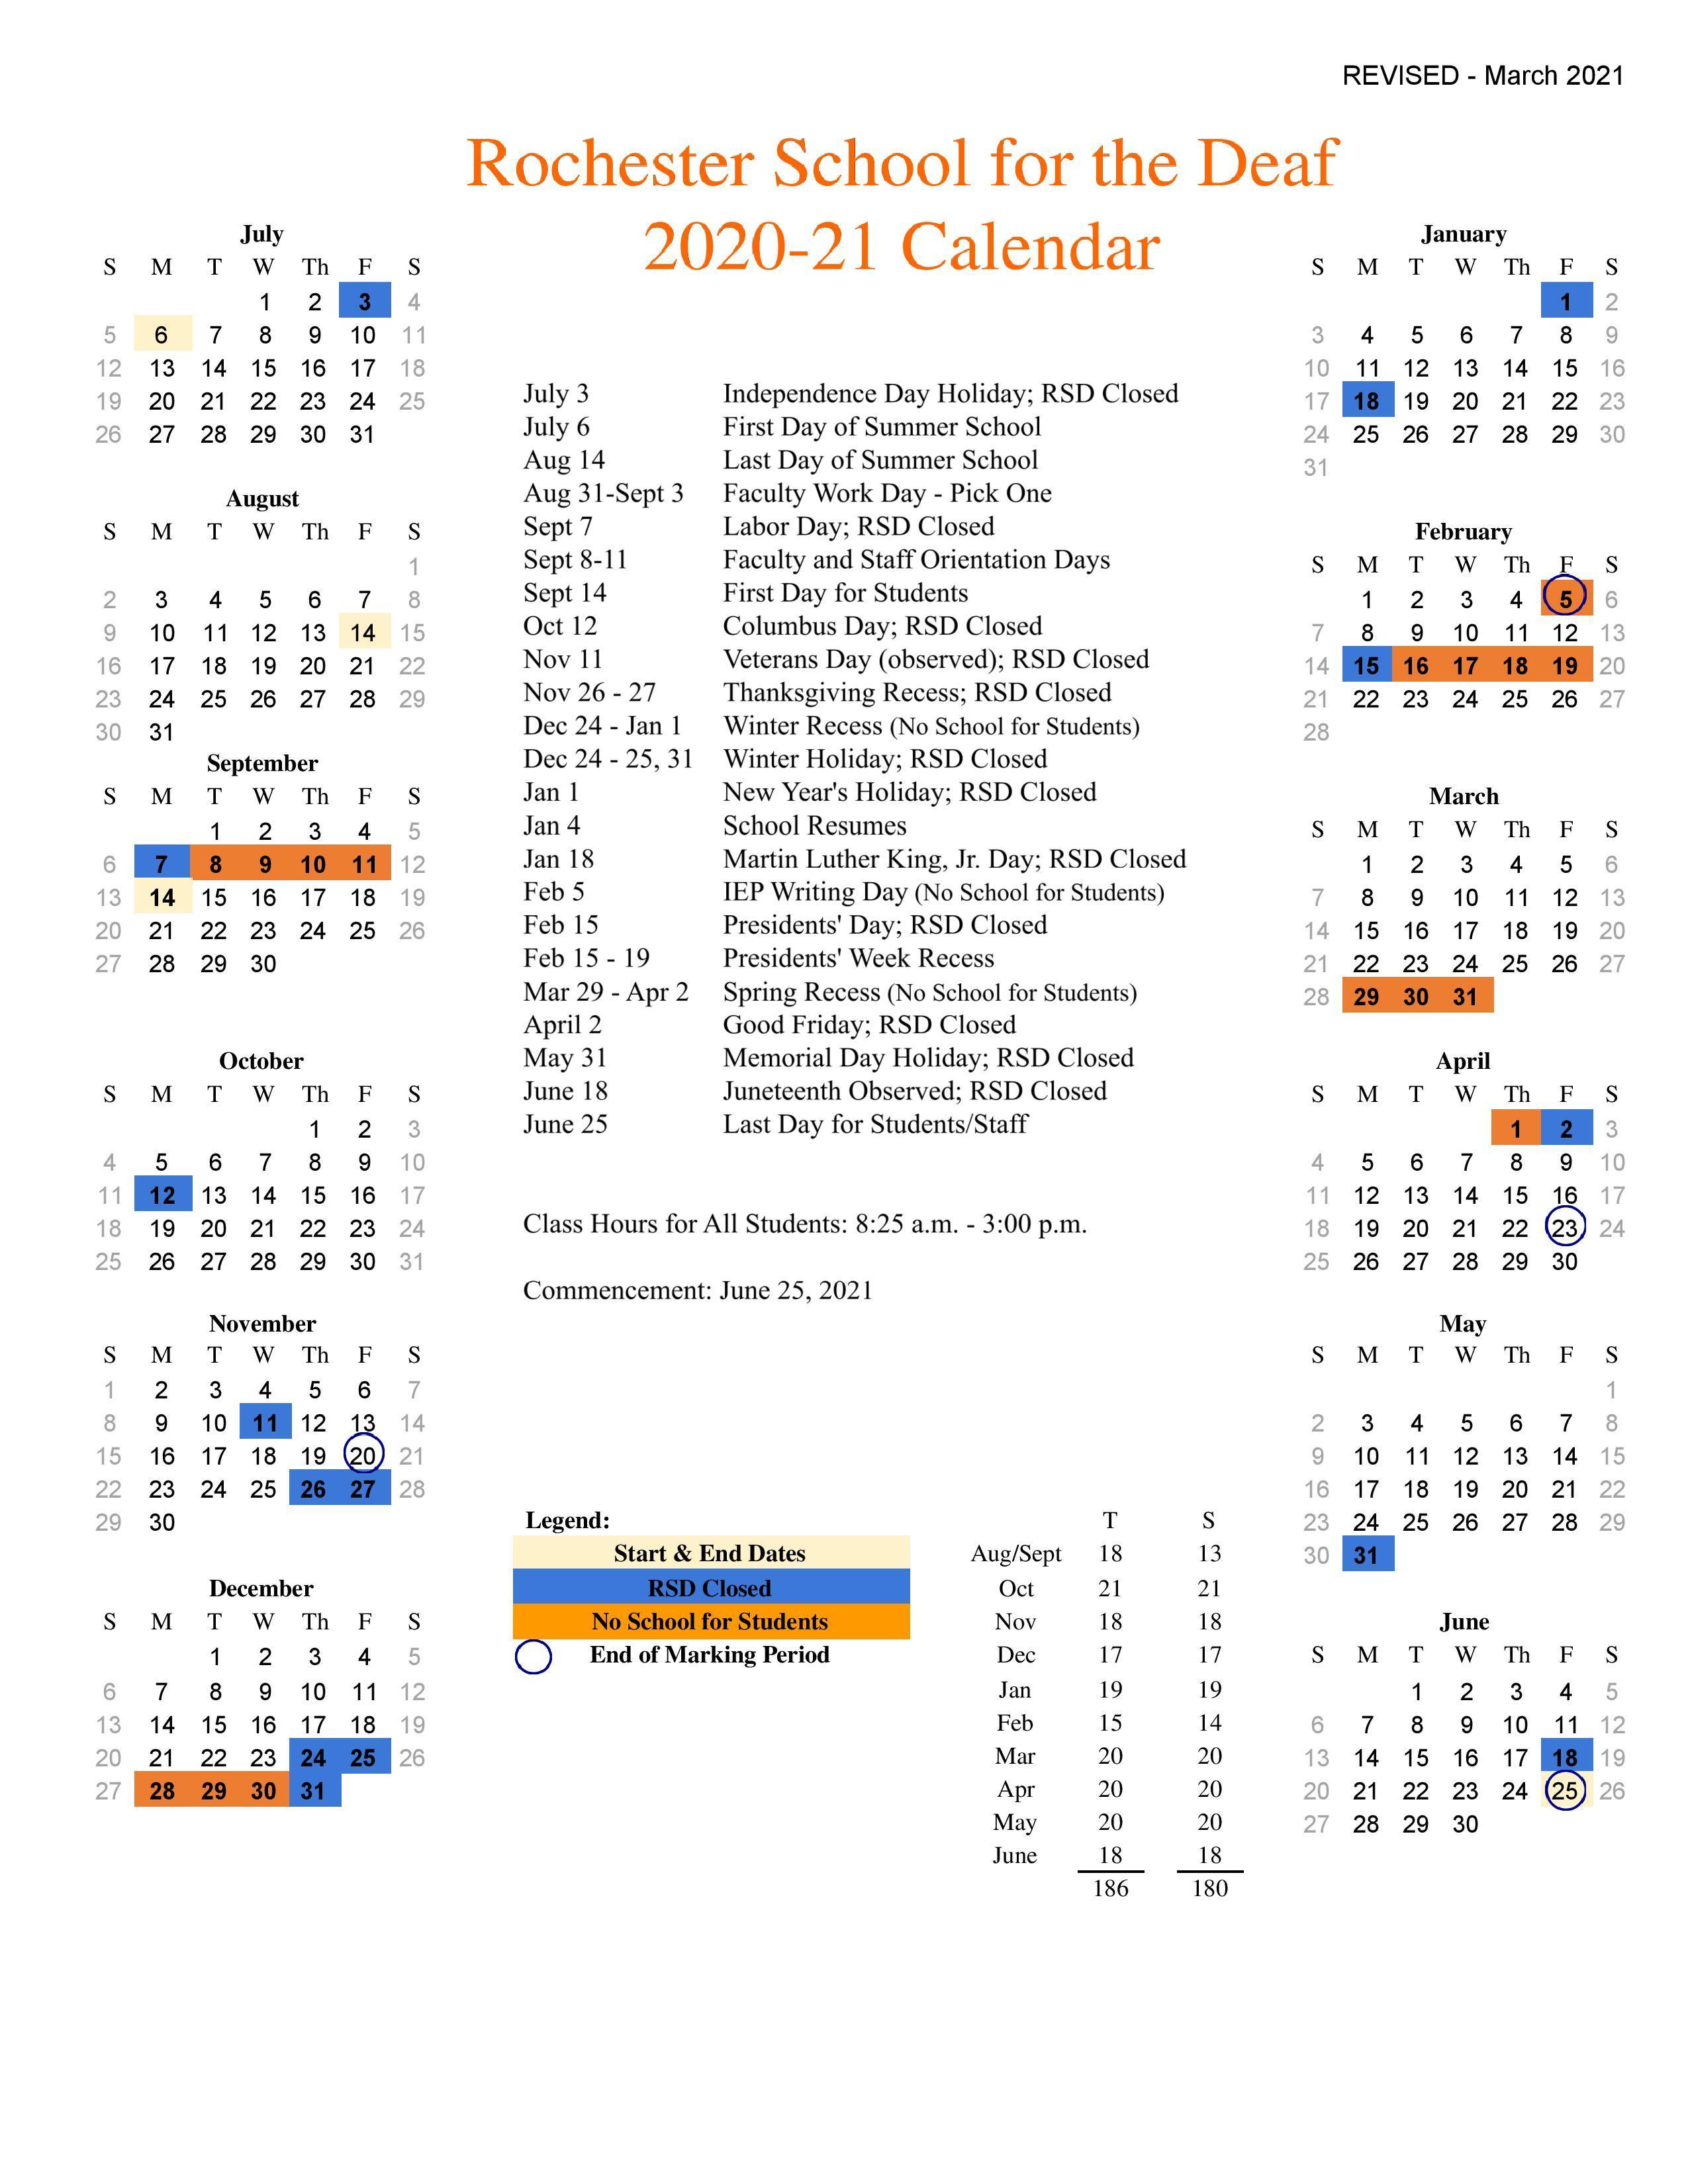 University Of Rochester Academic Calendar 2022.Academic Calendar About Rsd Rochester School For The Deaf